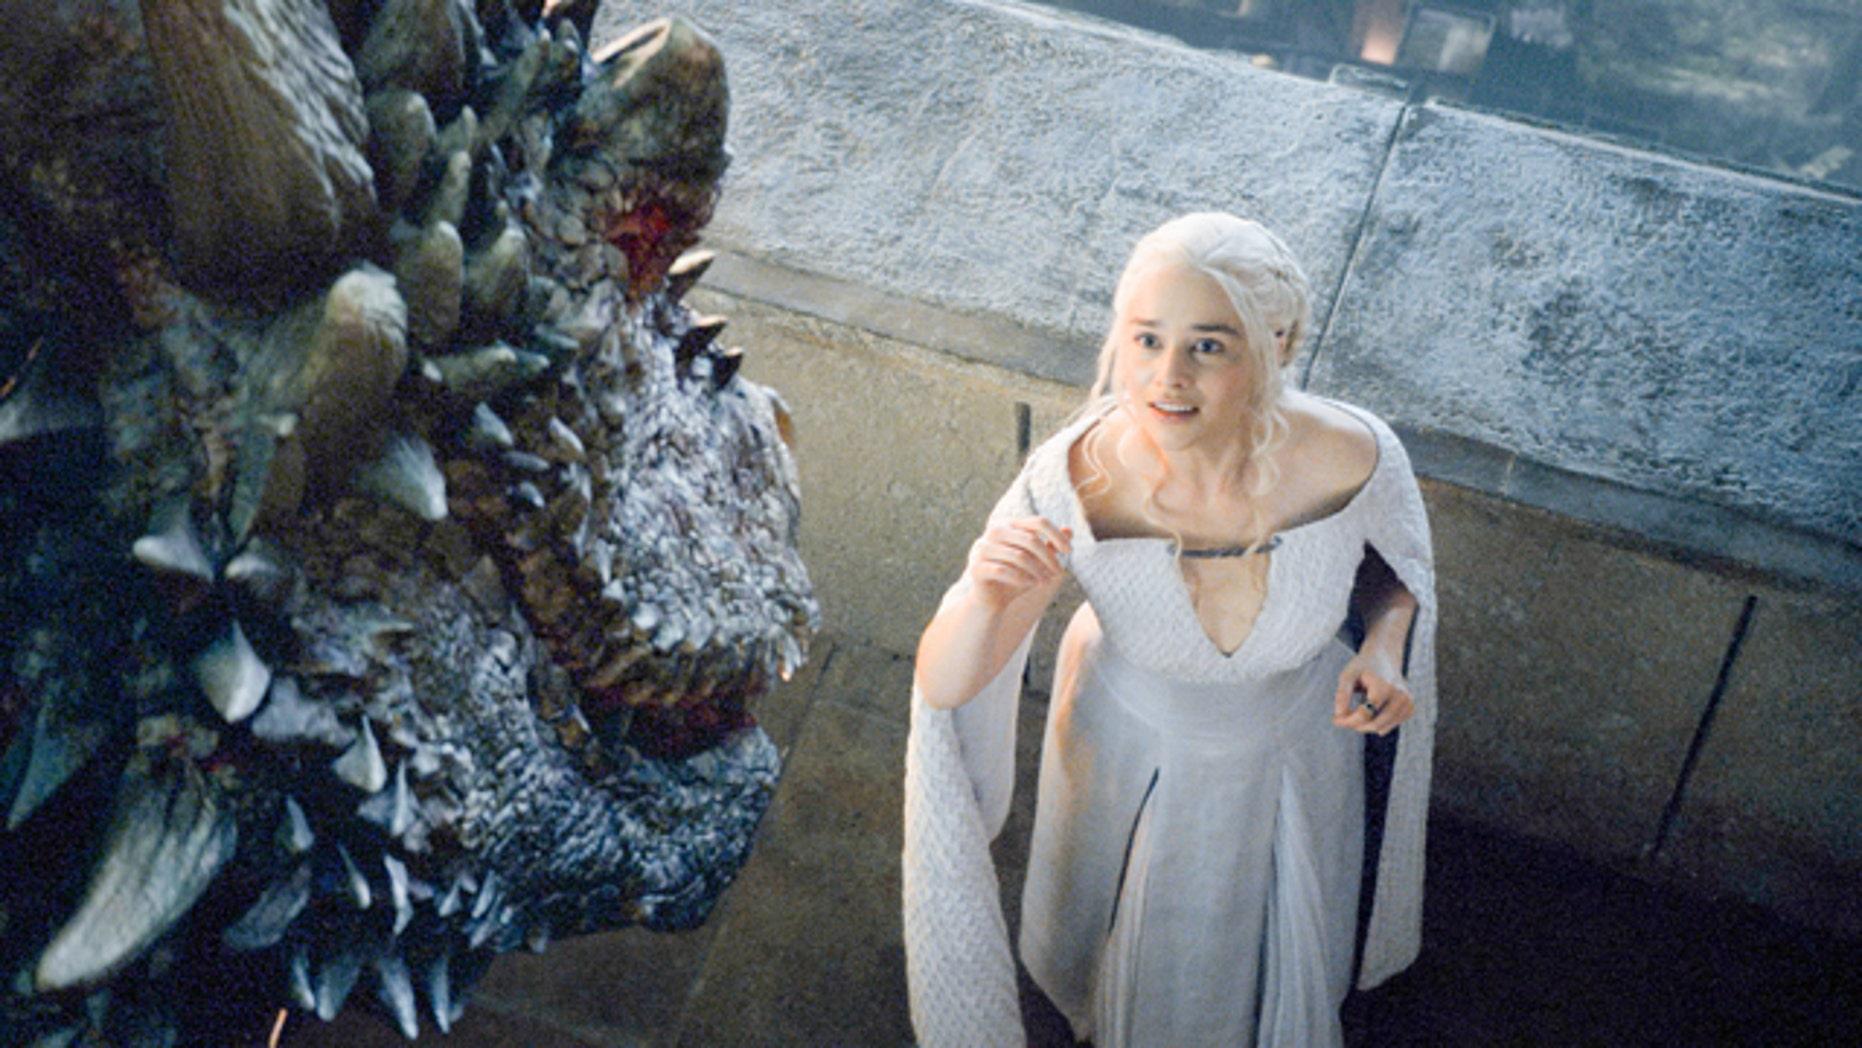 Daenerys Targaryen (Emilia Clarke) faces down an unfriendly dragon on 'Game of Thrones' (Courtesy Home Box Office)